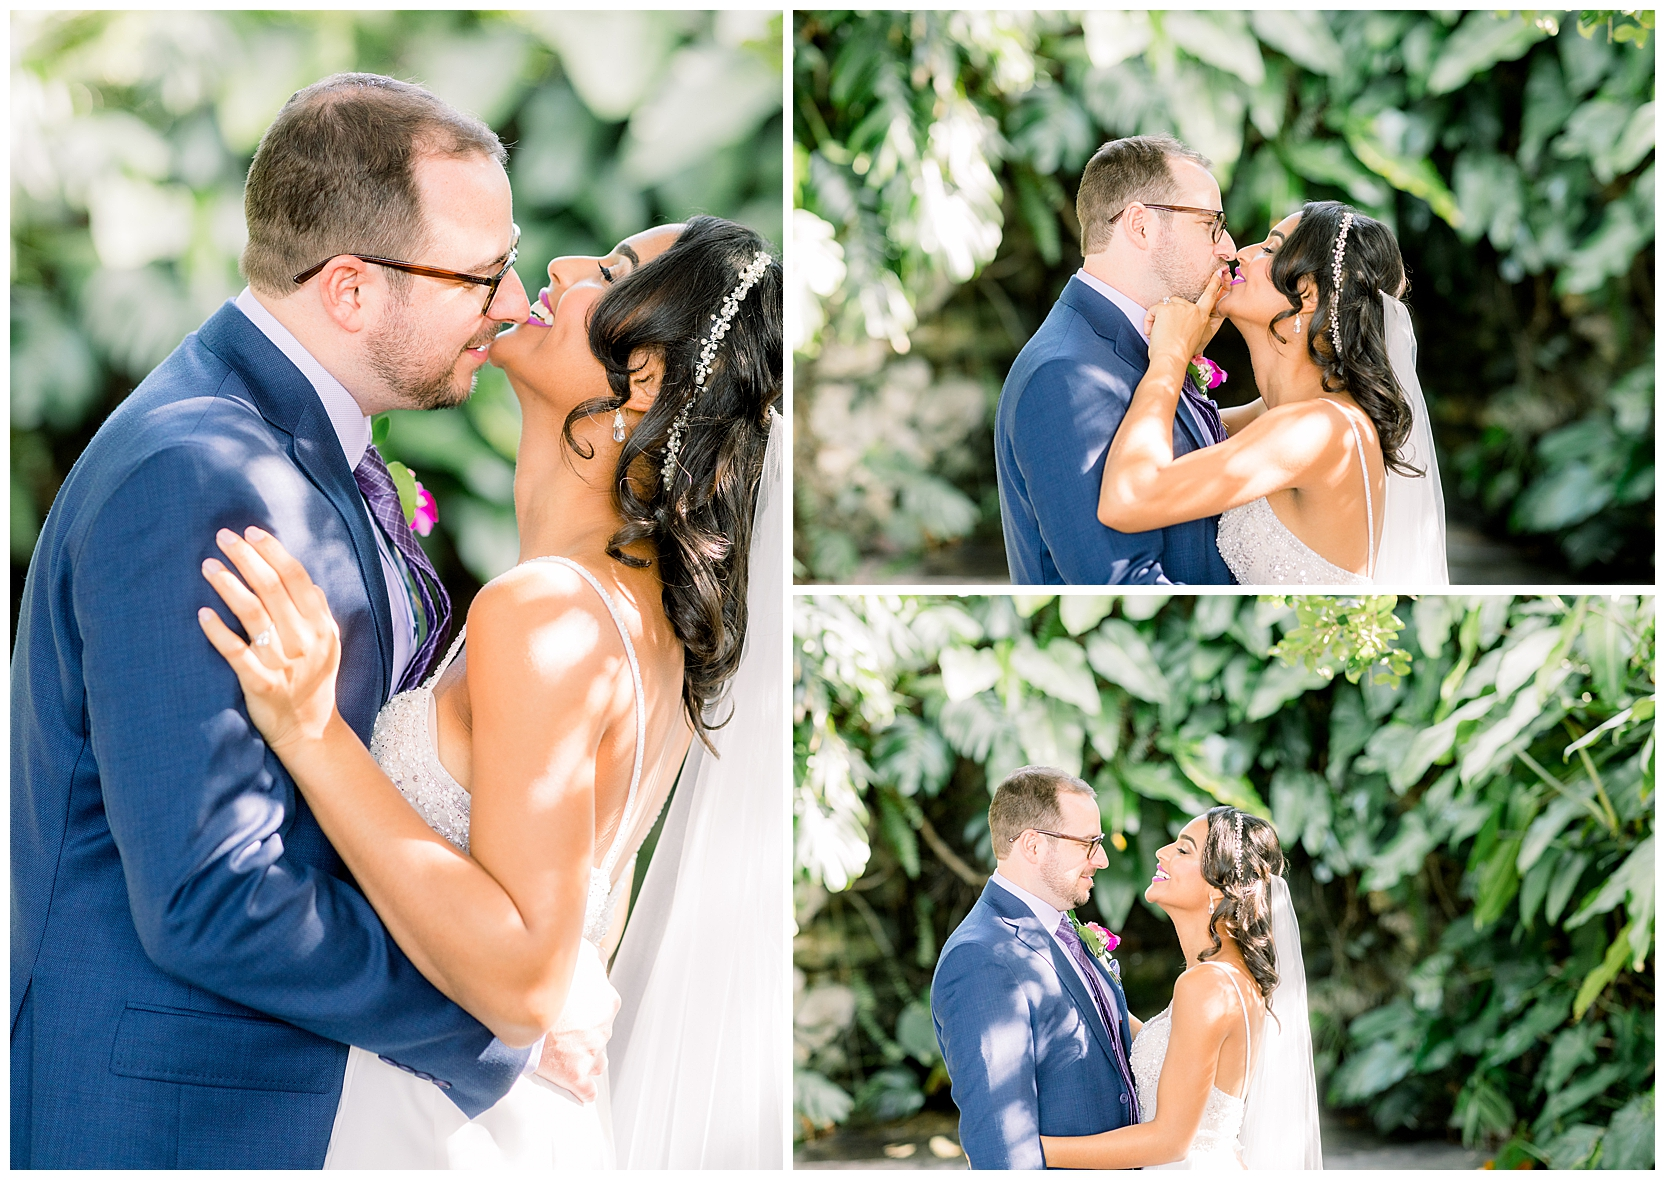 jessicafredericks_lakeland_tampa_wedding_purple_crazy hour_0027.jpg